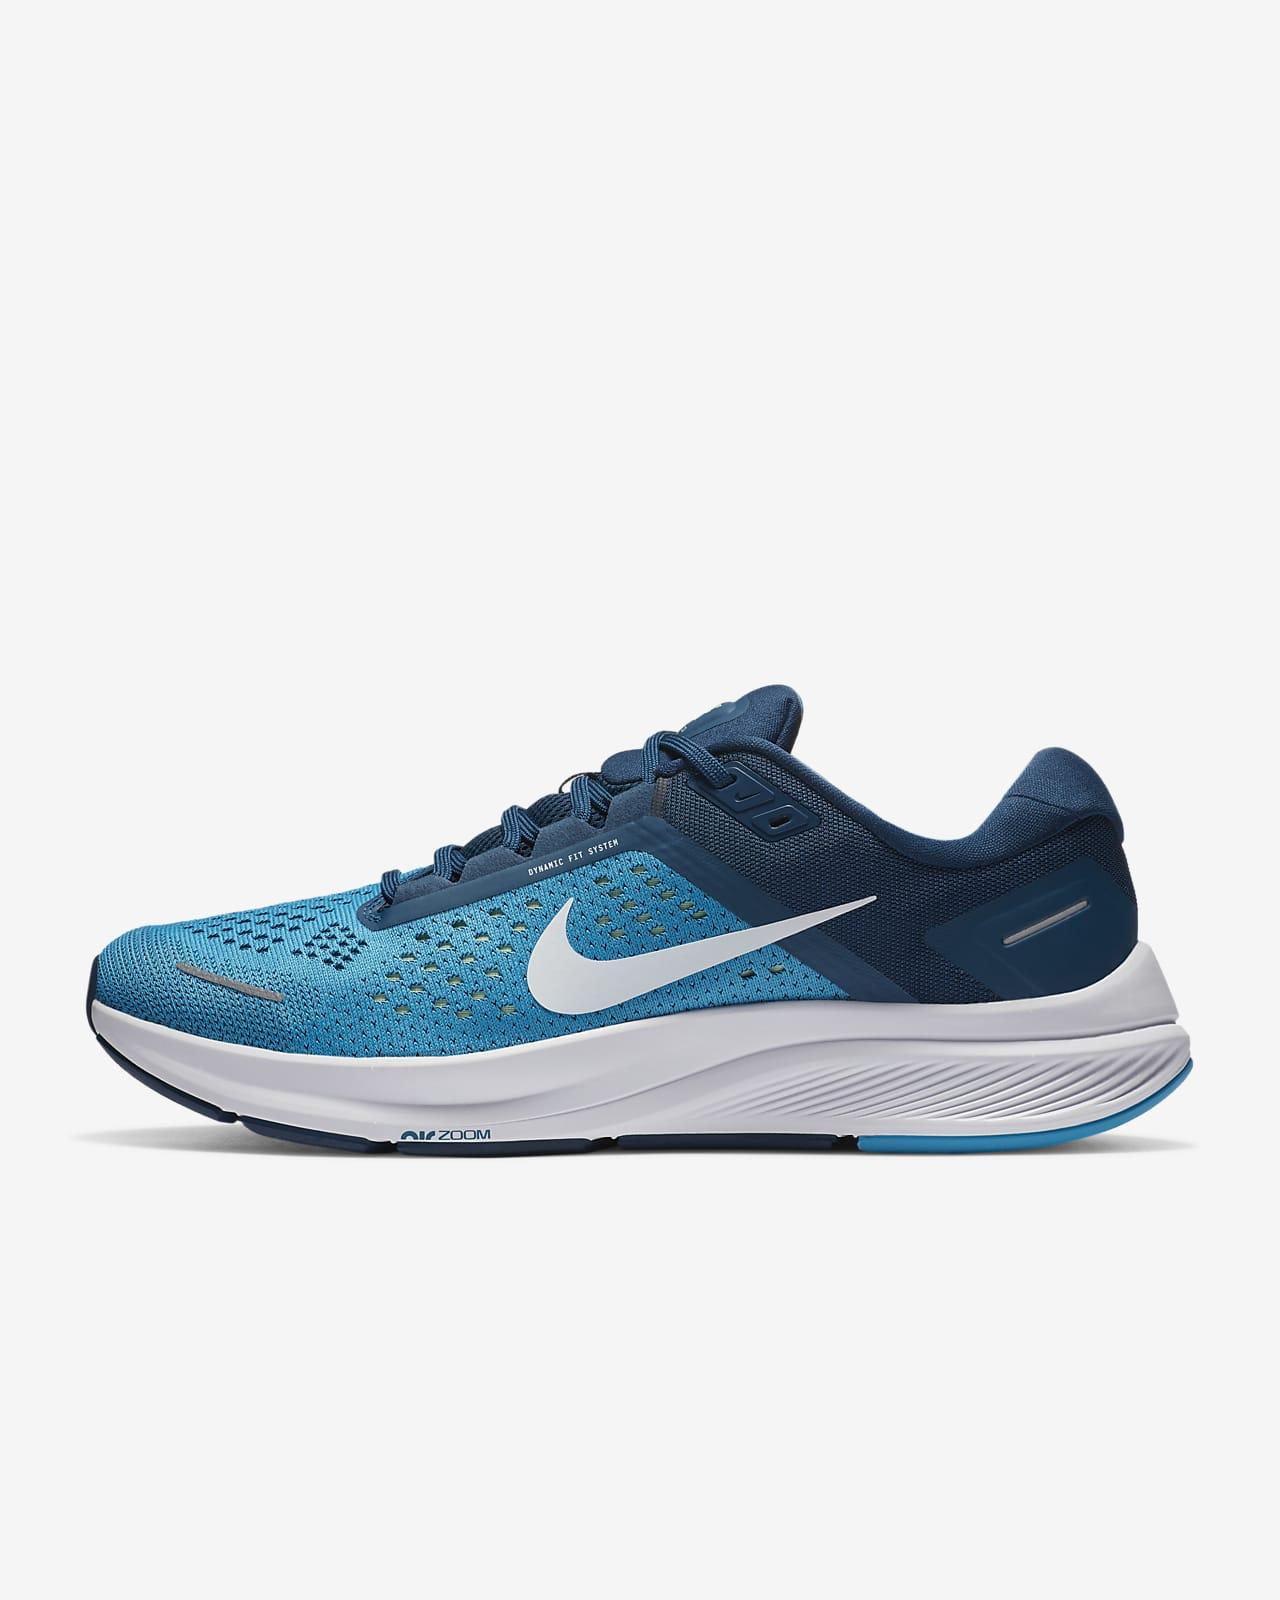 Nike Air Zoom Structure 23 Zapatillas de running - Hombre